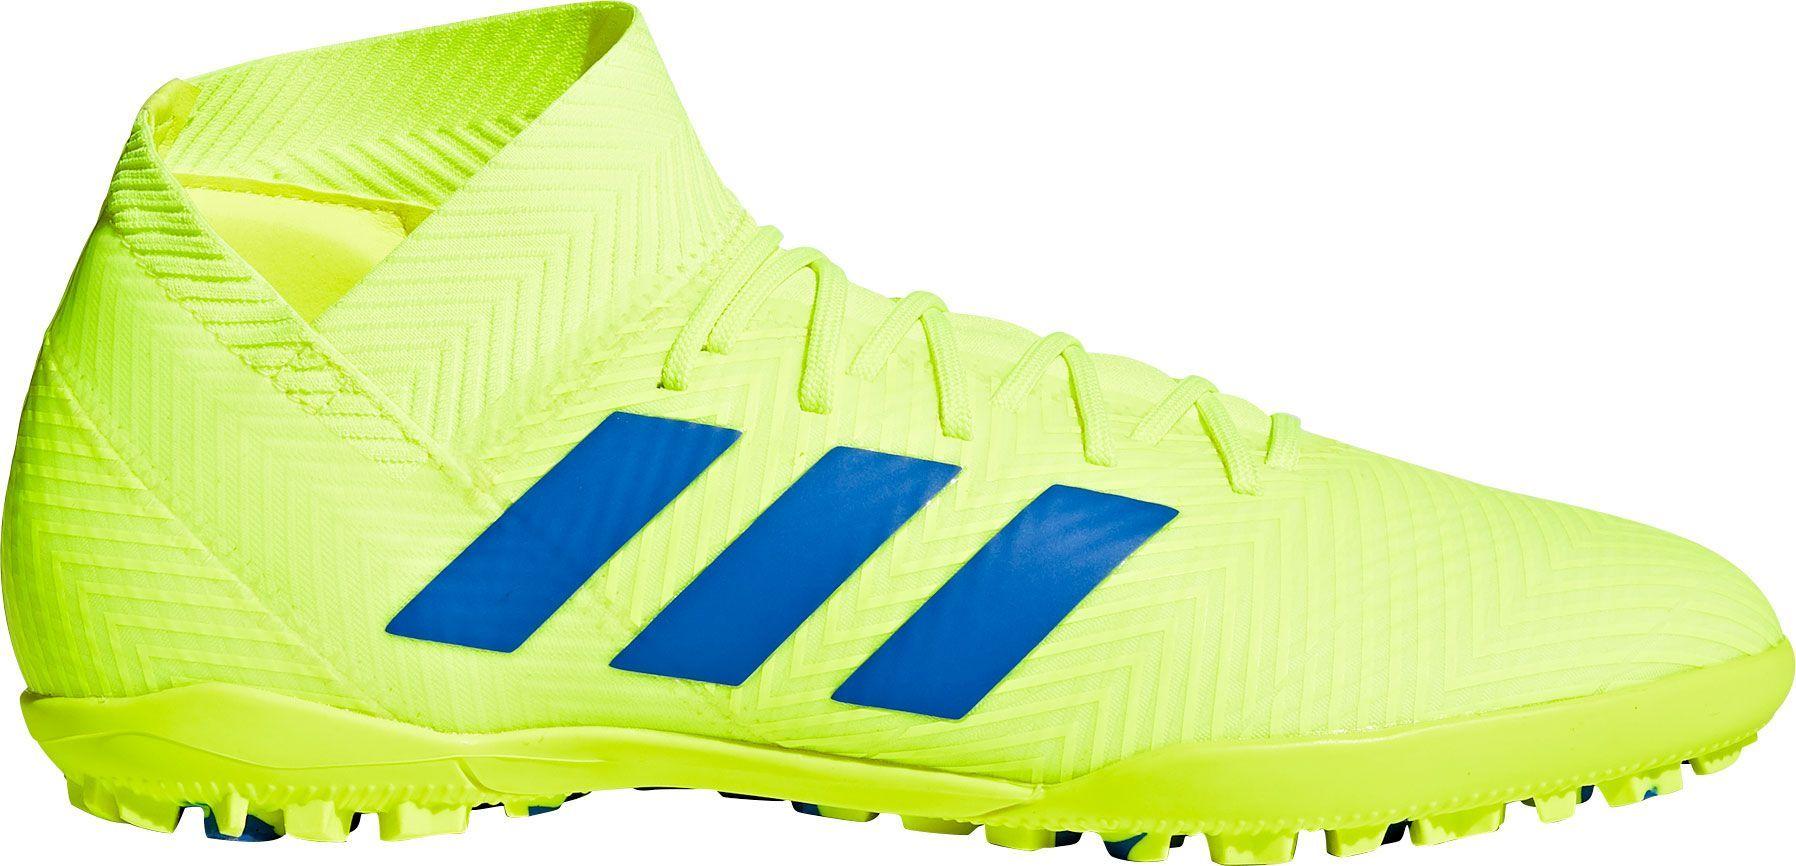 adidas Men's Nemeziz Tango 18.3 Turf Soccer Shoe